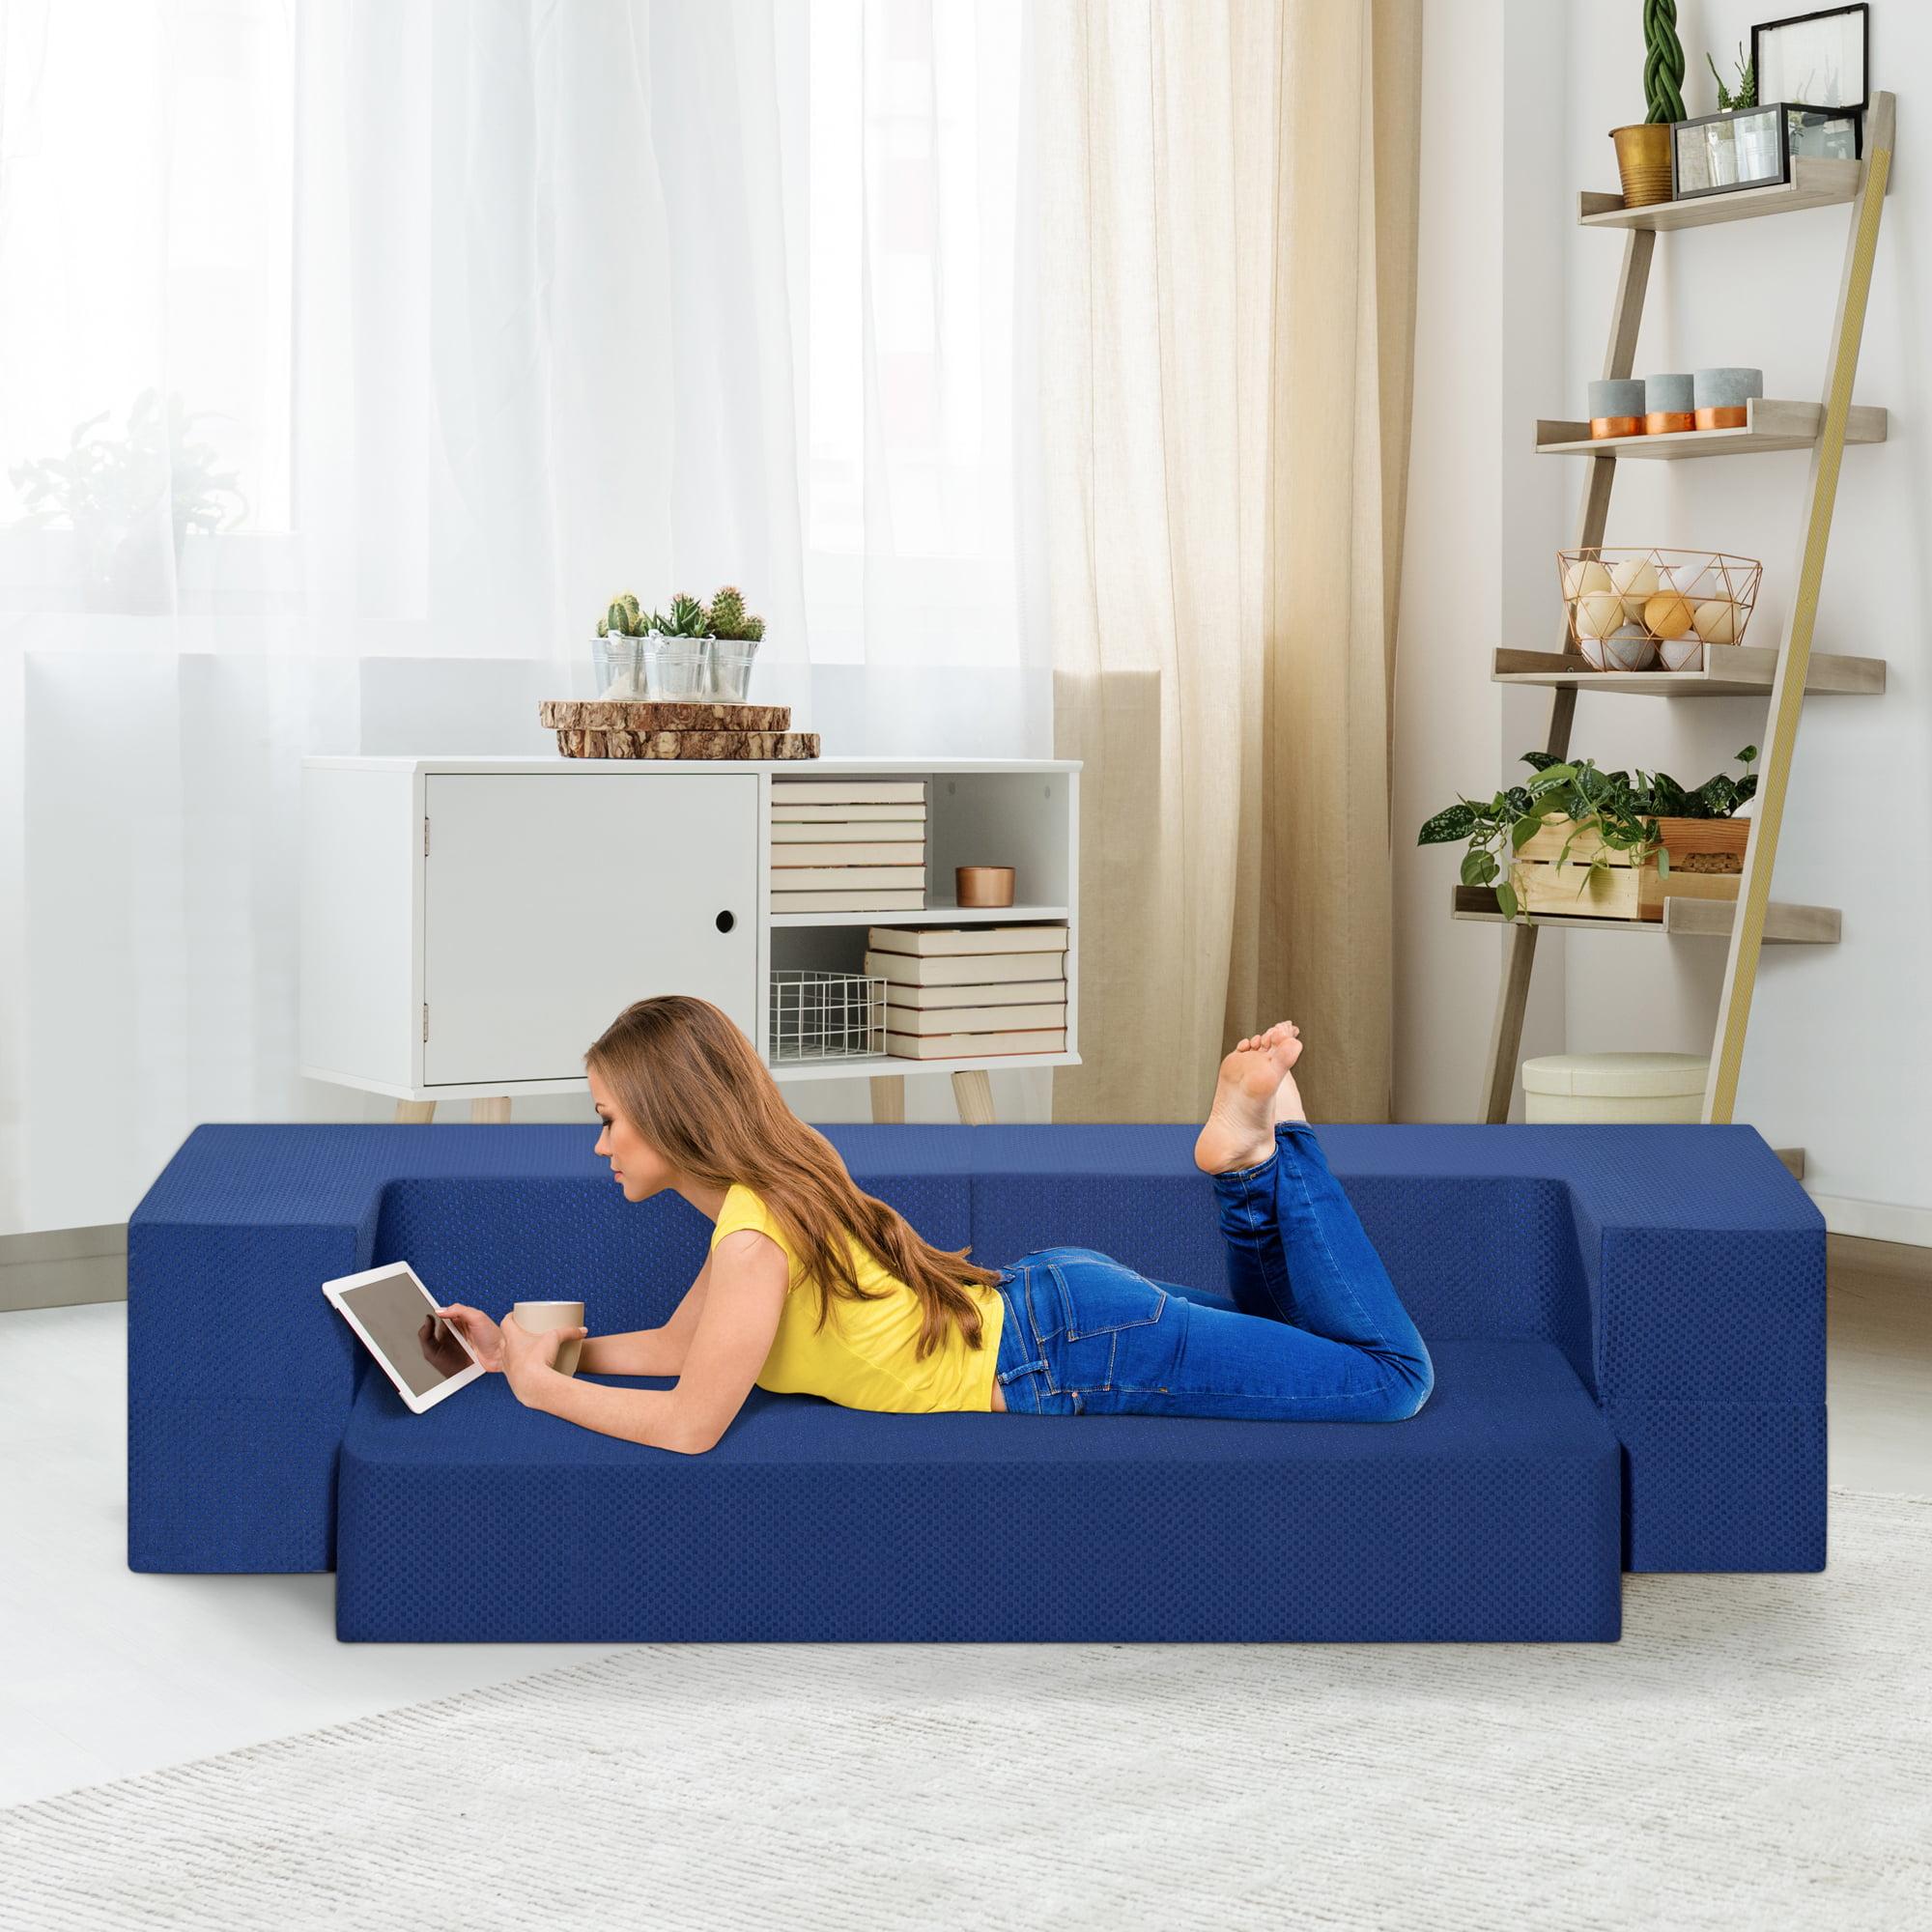 GranRest 8'' 3-in-1 Gel Memory Foam Mattress & Sofa Bed, Dark Blue